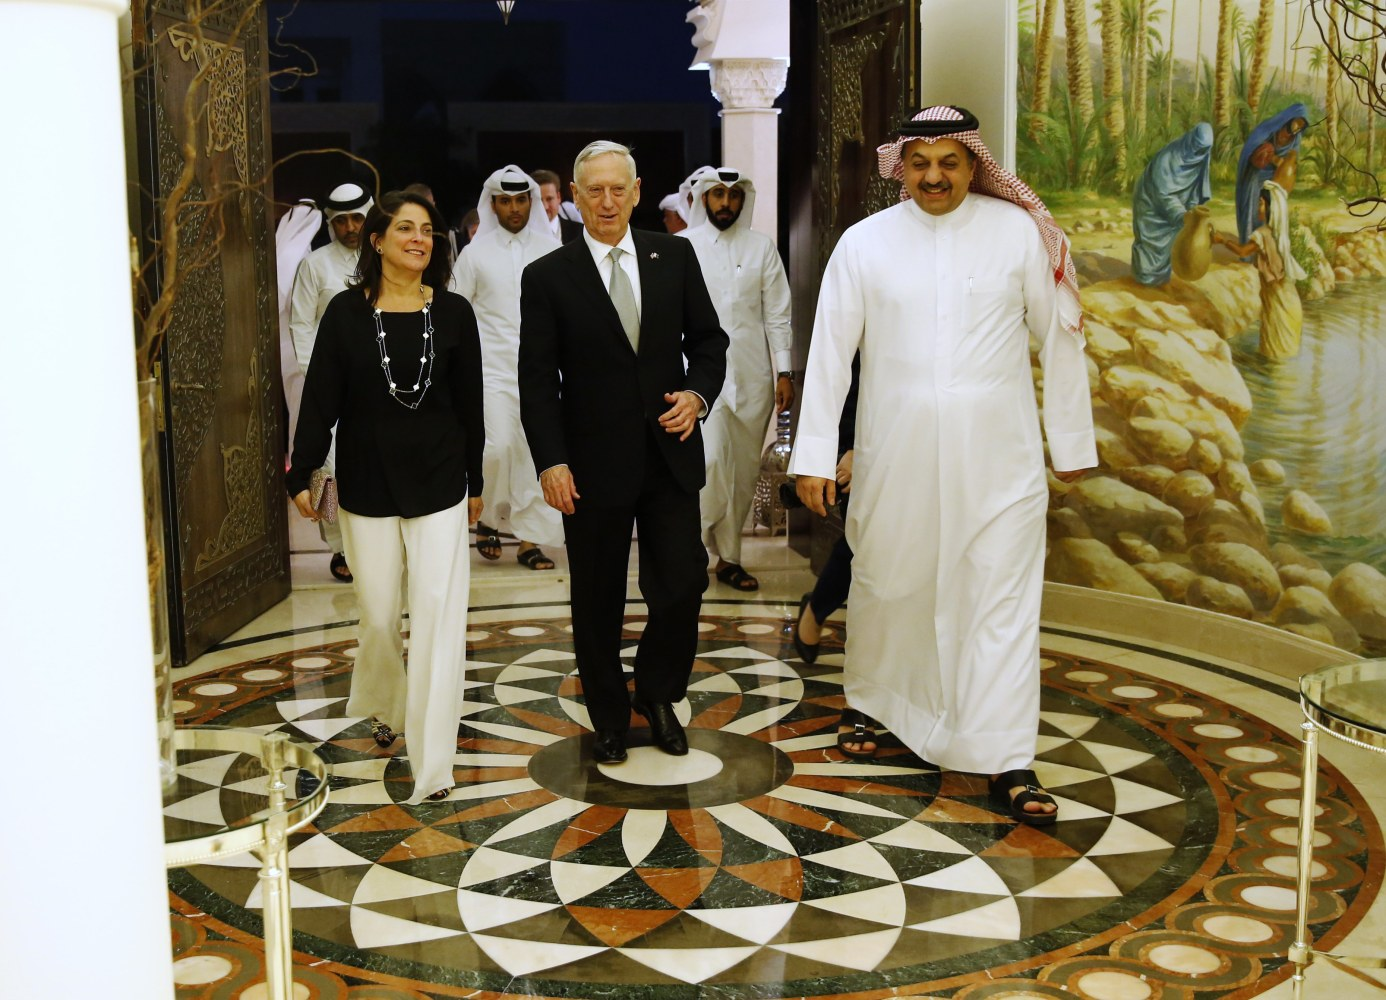 US ambassador to Qatar appears to criticize Comey firing